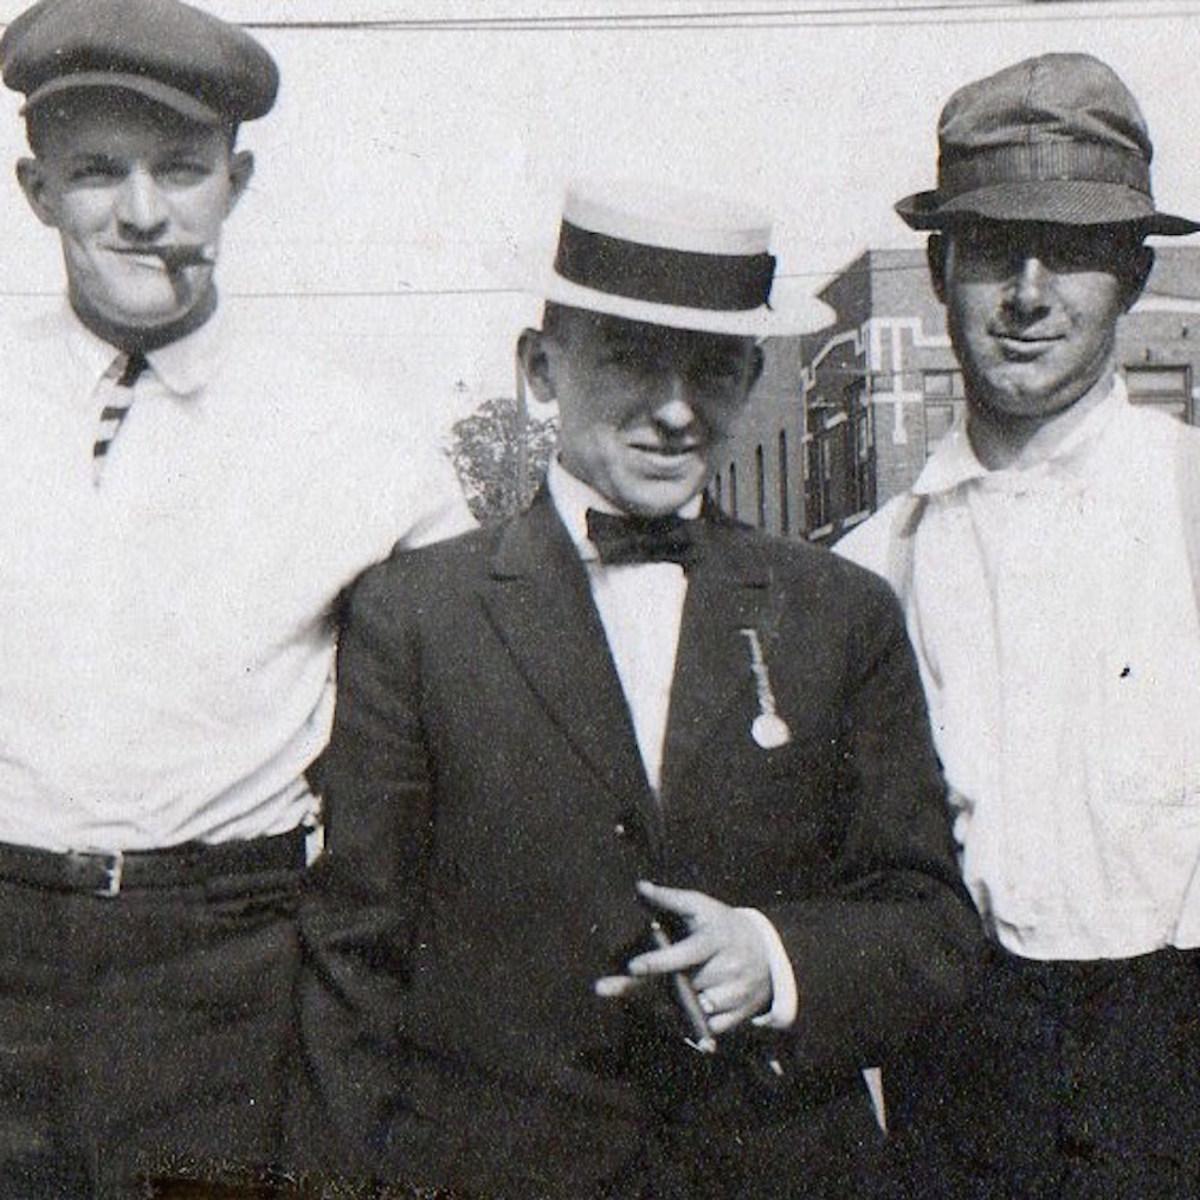 Irish immigrants in Kansas City, Missouri, in the early 20th century.